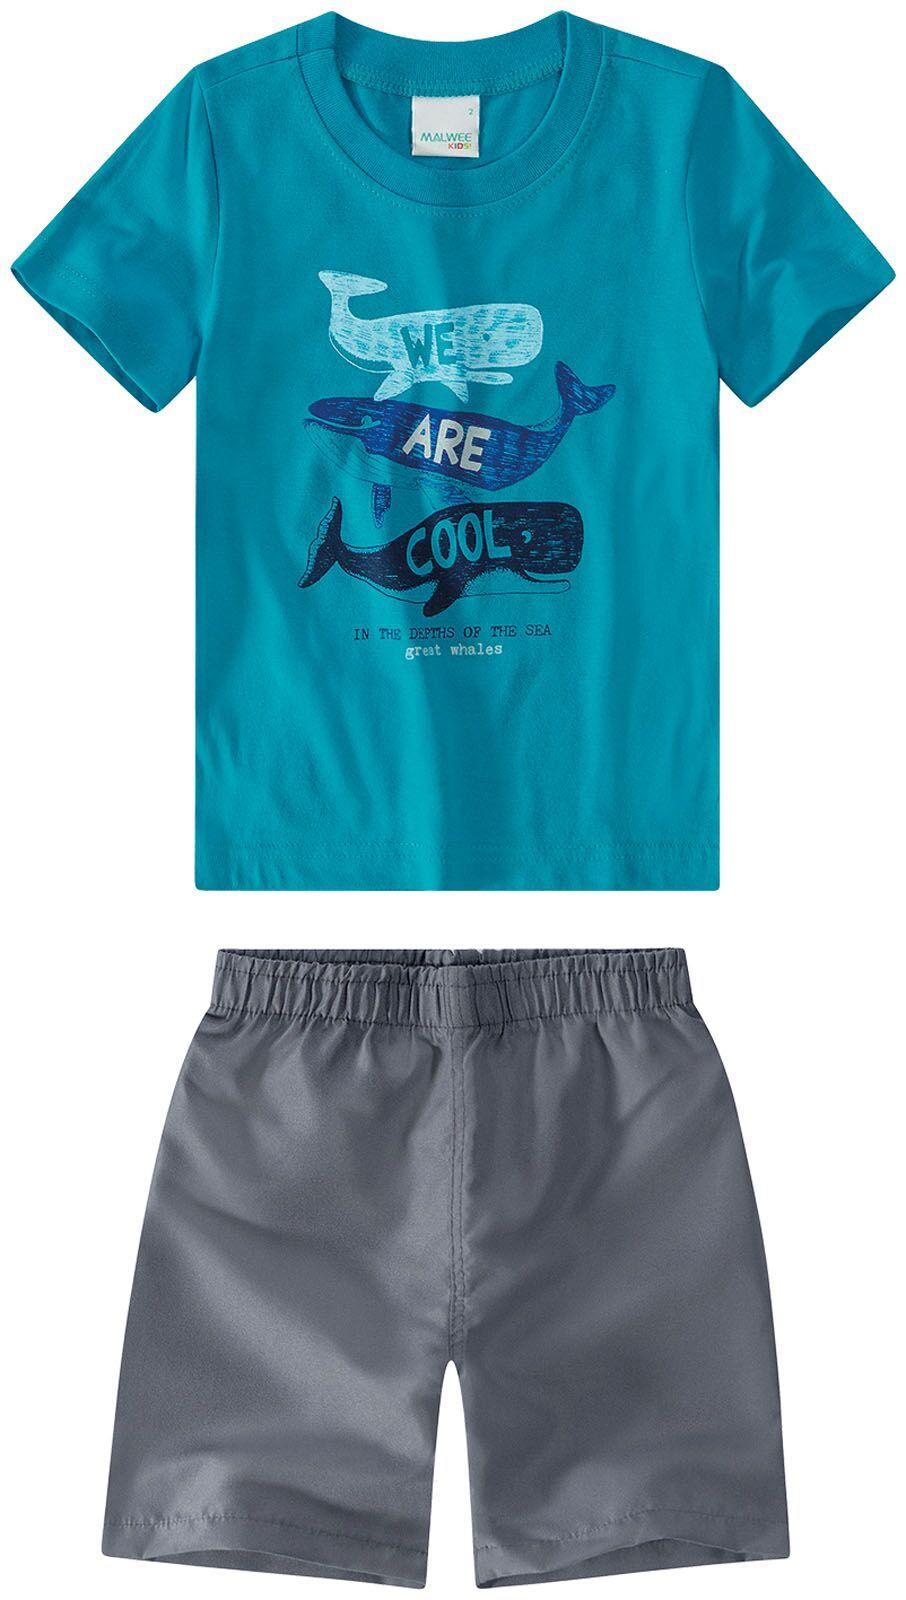 Conjunto Camiseta + Bermuda - Malwee - Estampa Baleia